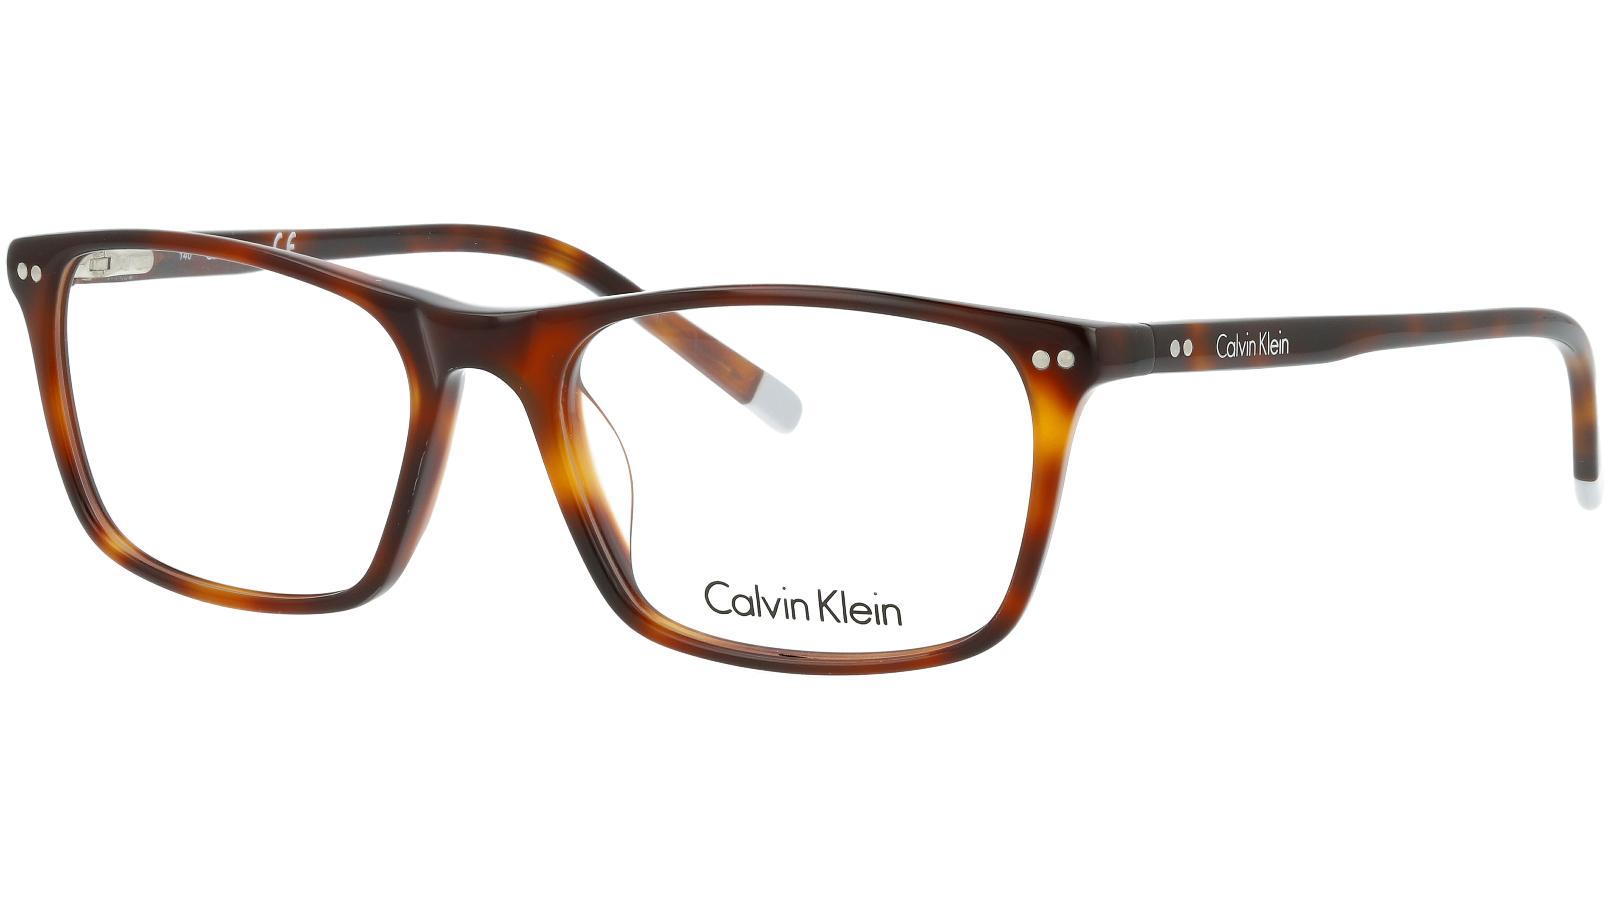 Calvin Klein CK5968 214 53 Havana Glasses